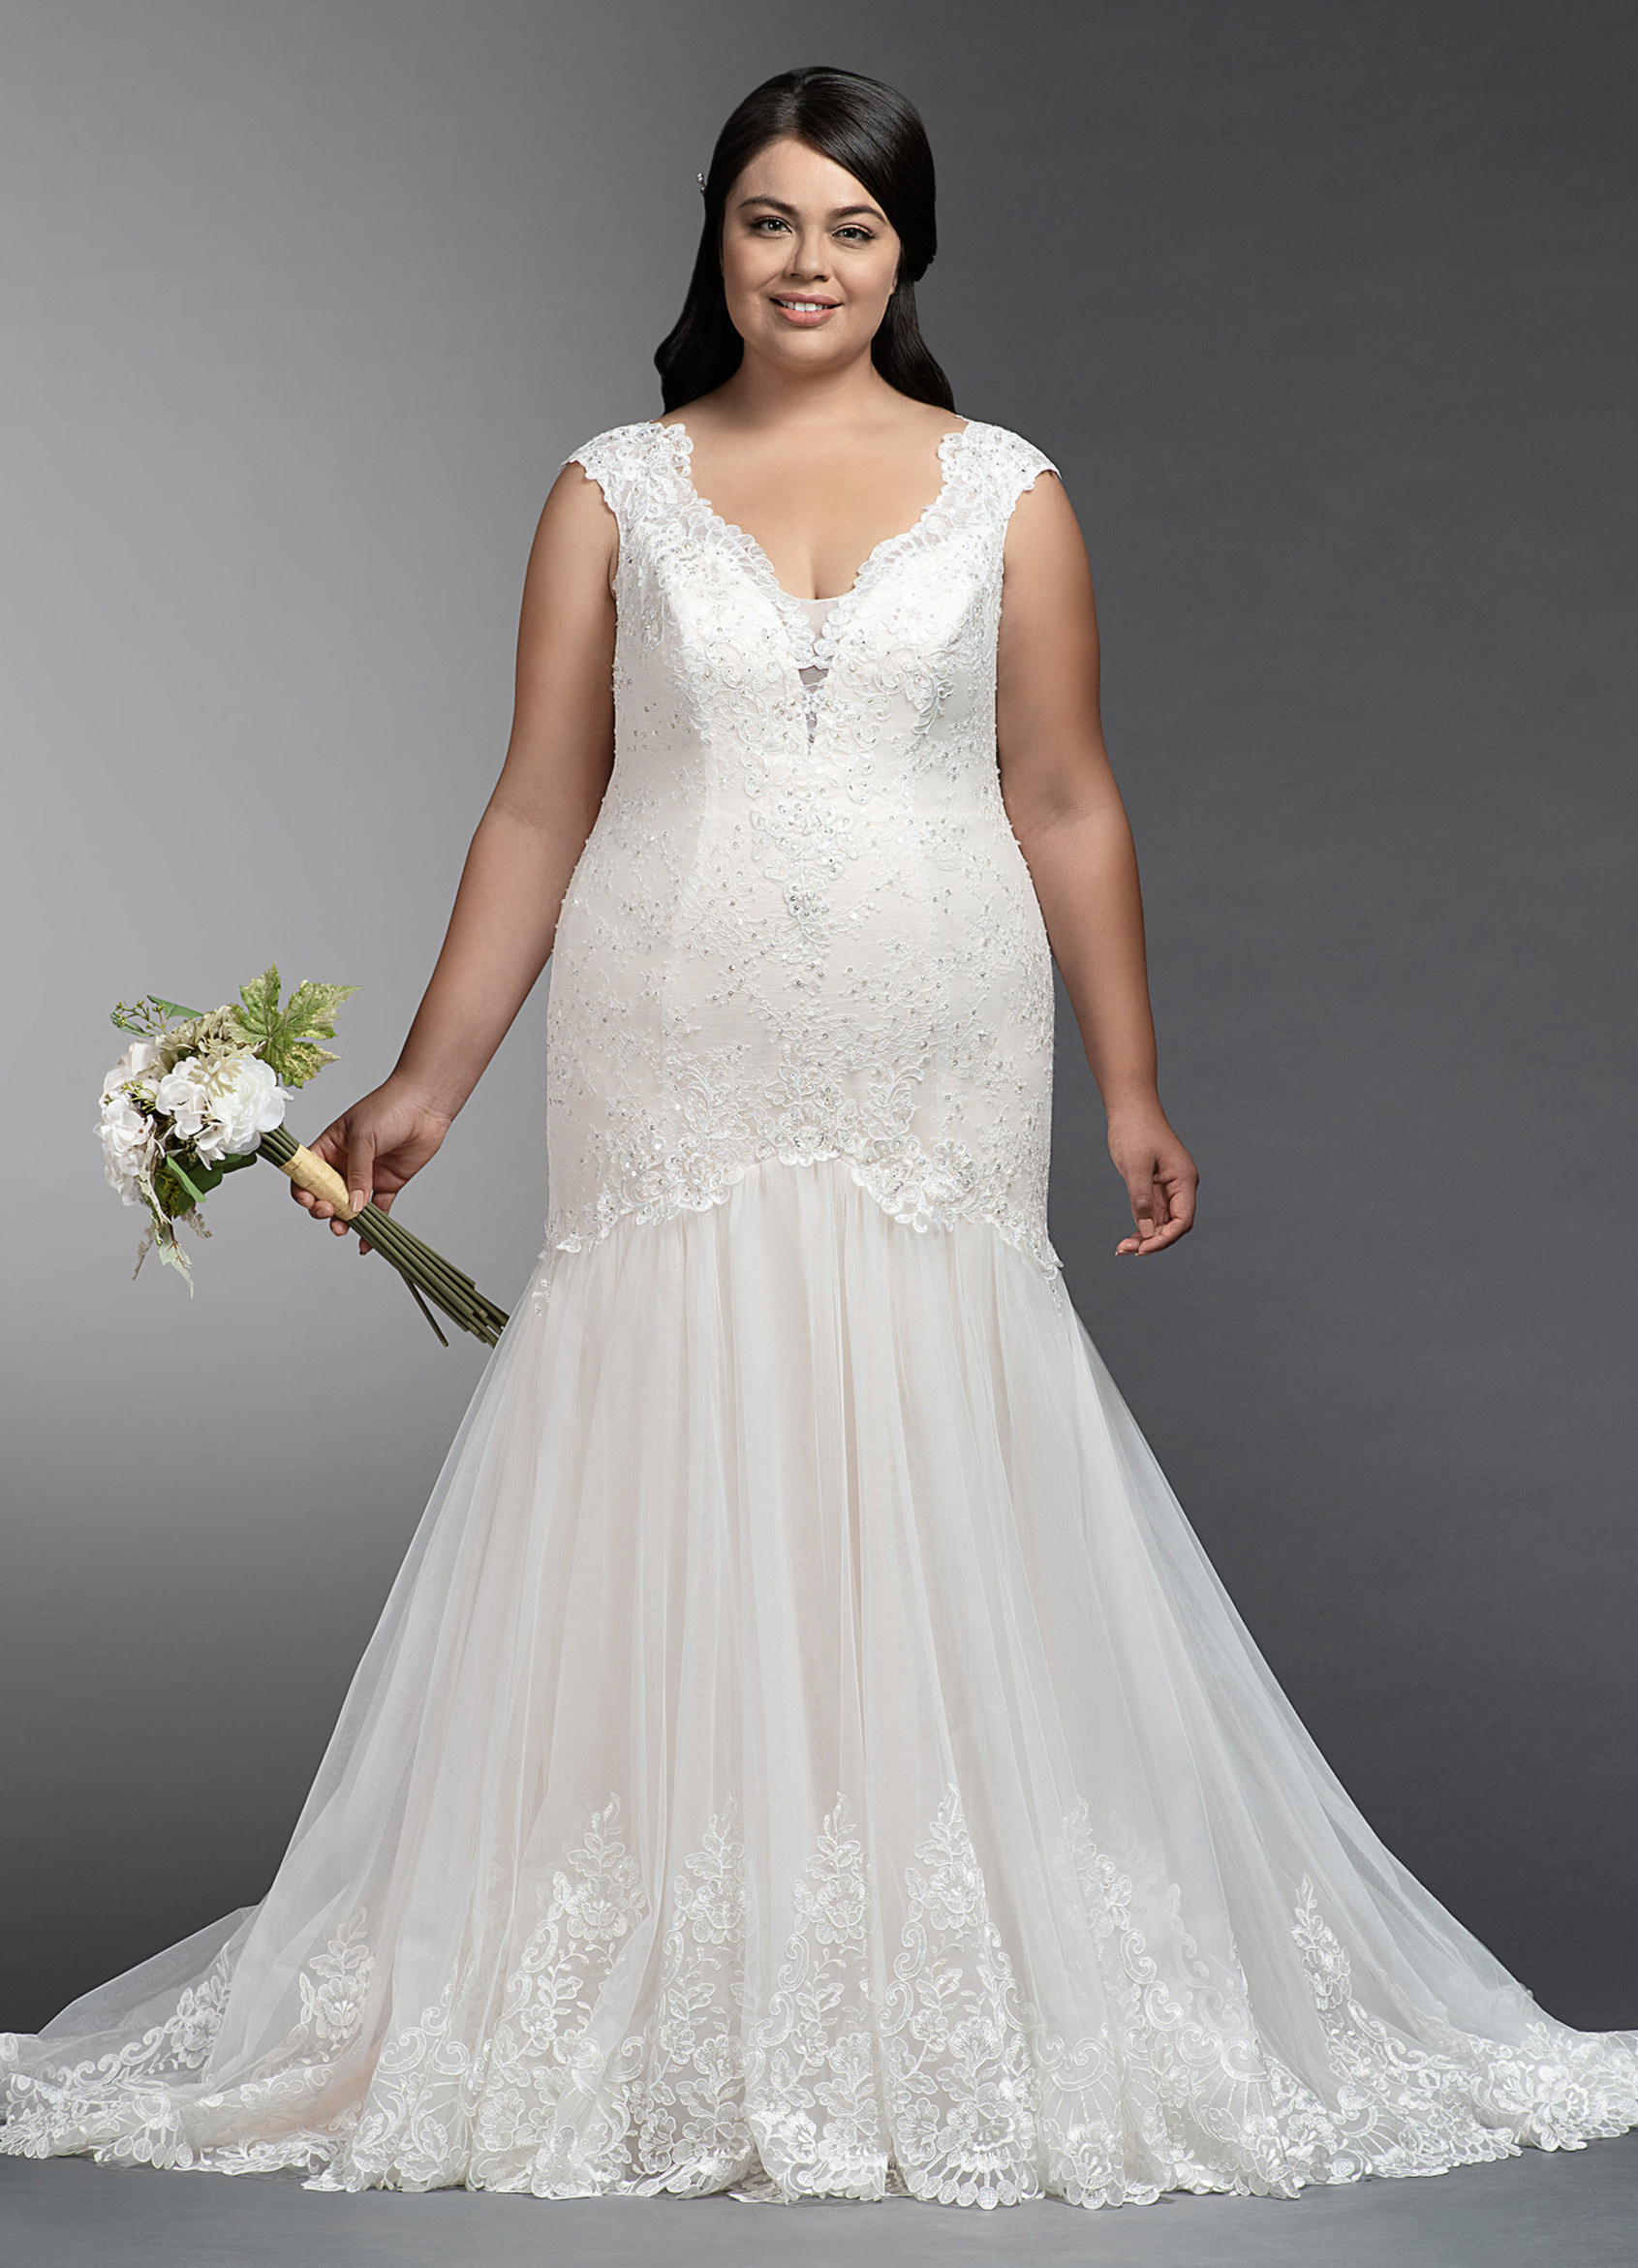 Bexley Bg Sample Dress